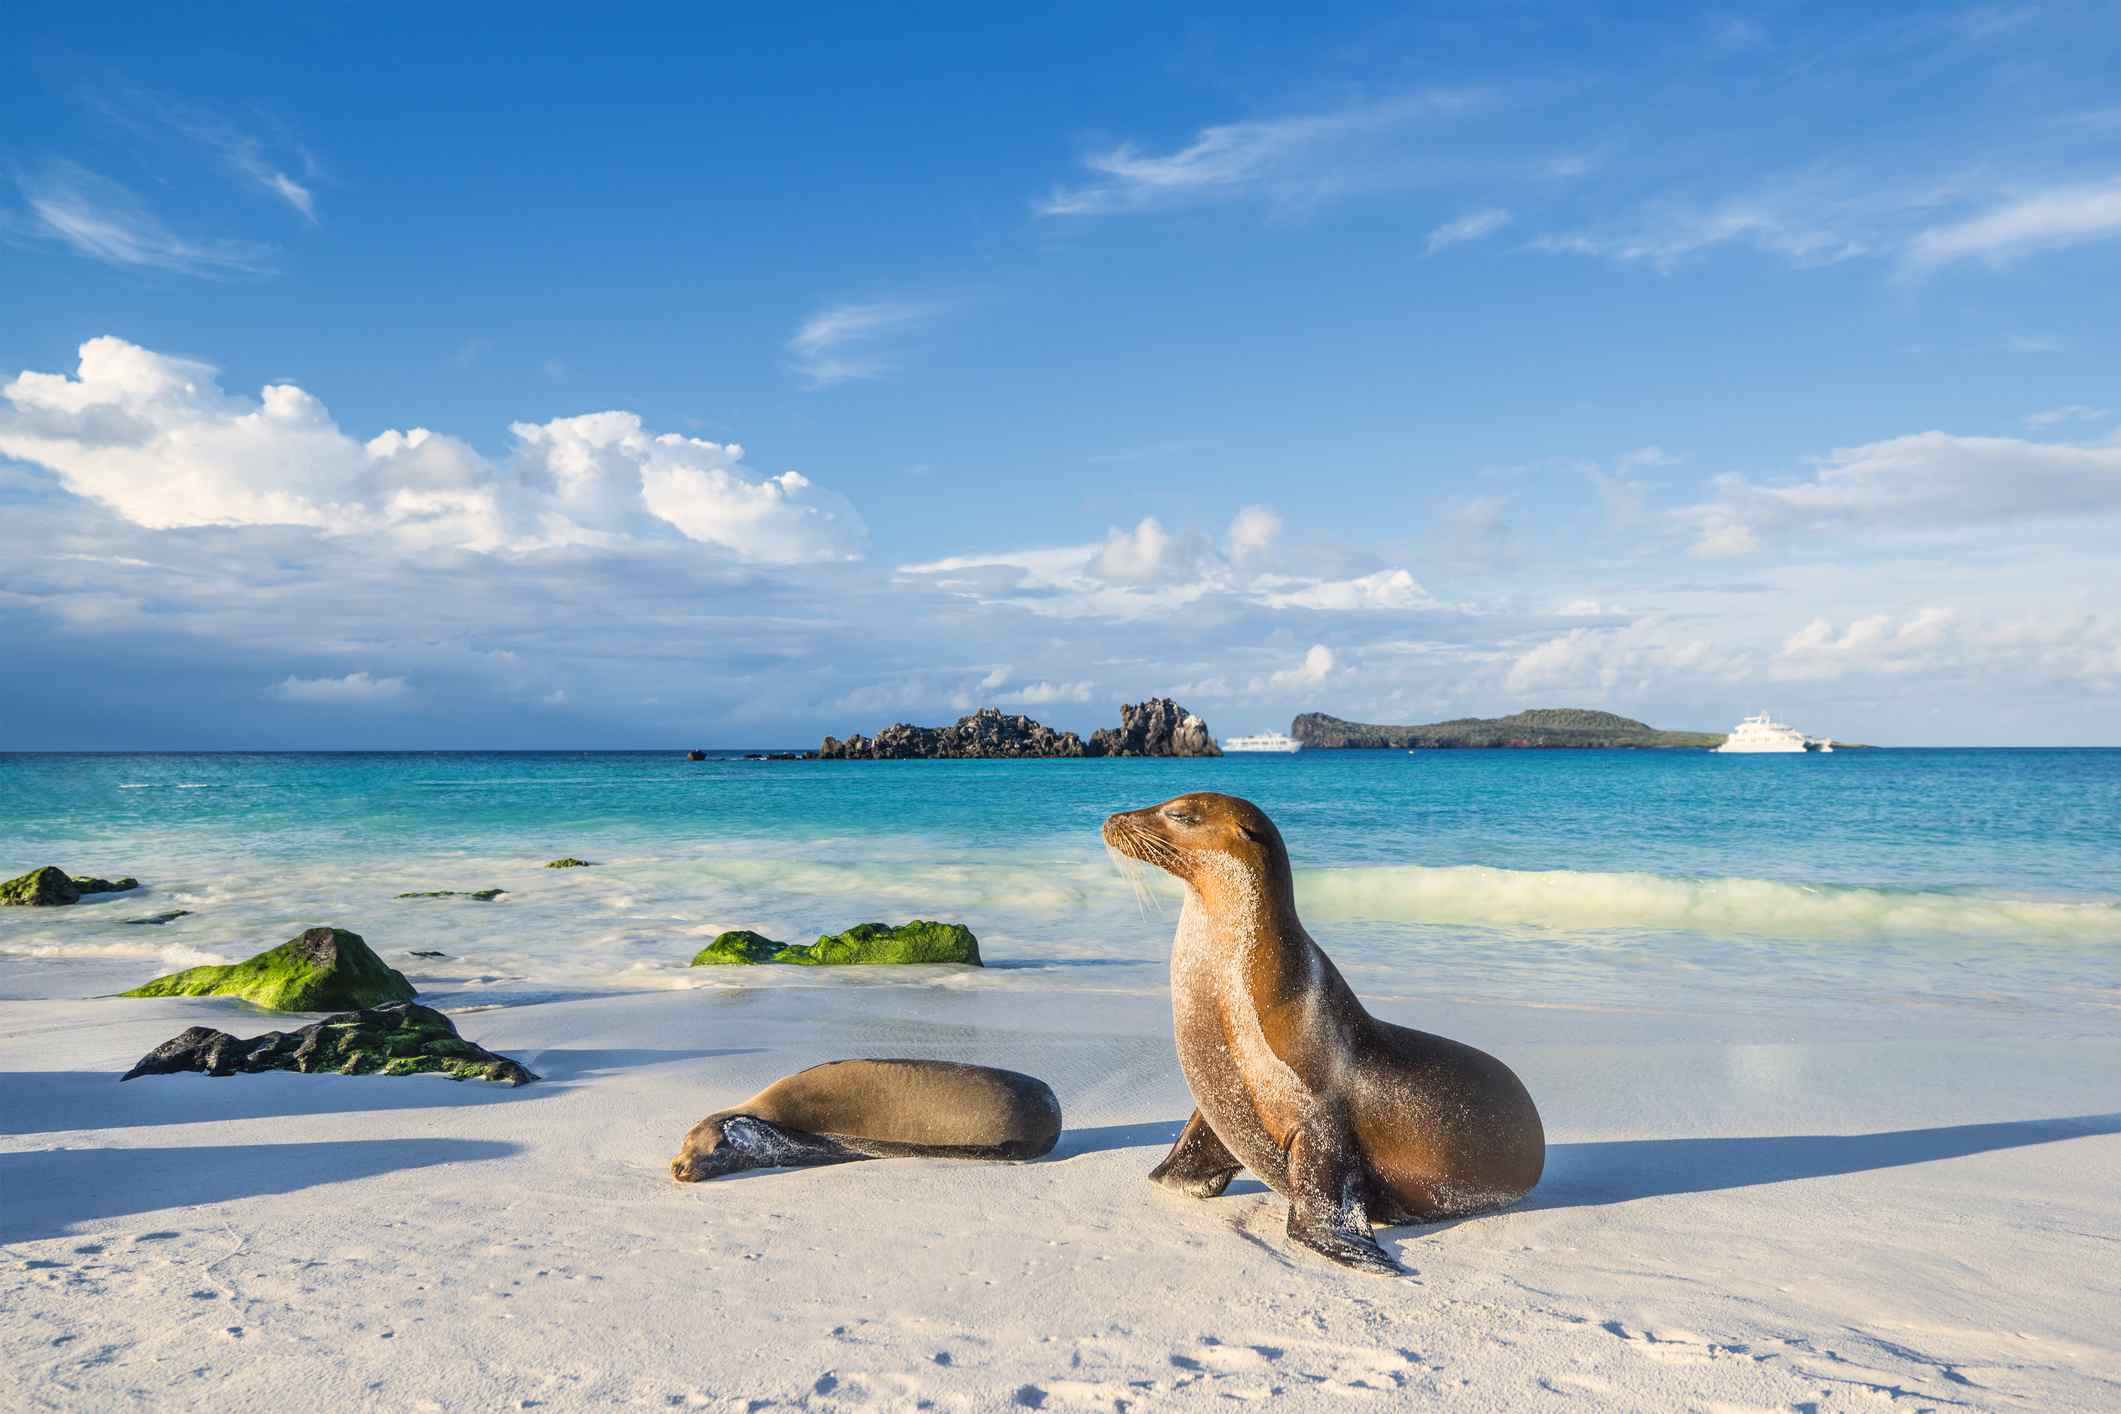 add_a_photo Embed Share Buy the print Comp Save to Board Galapagos sea lion (Zalophus wollebaeki) at the beach of Espanola island